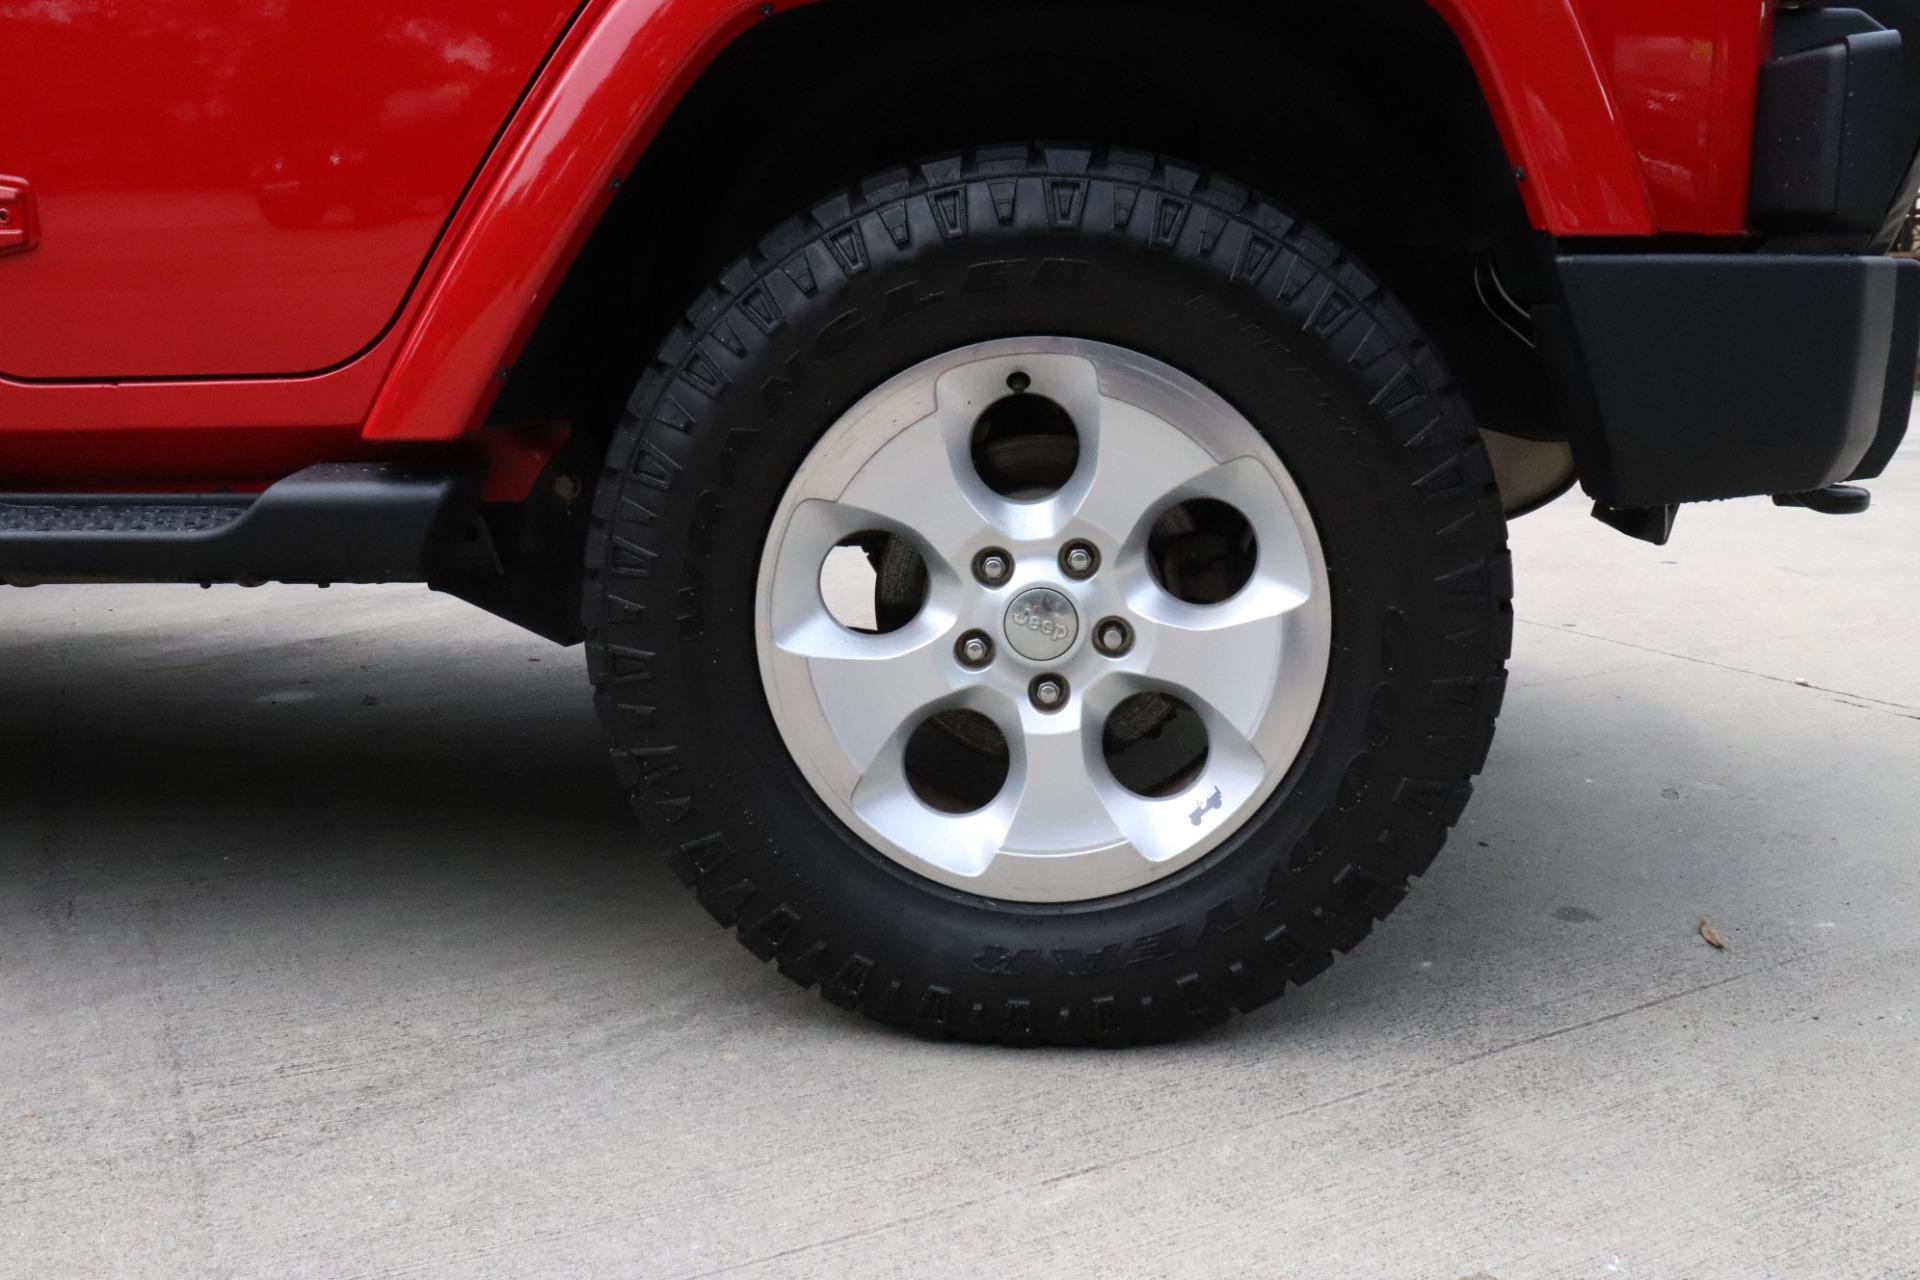 Used-2014-Jeep-Wrangler-Unlimited-Sahara-4WD-4dr-Unlimited-Sahara